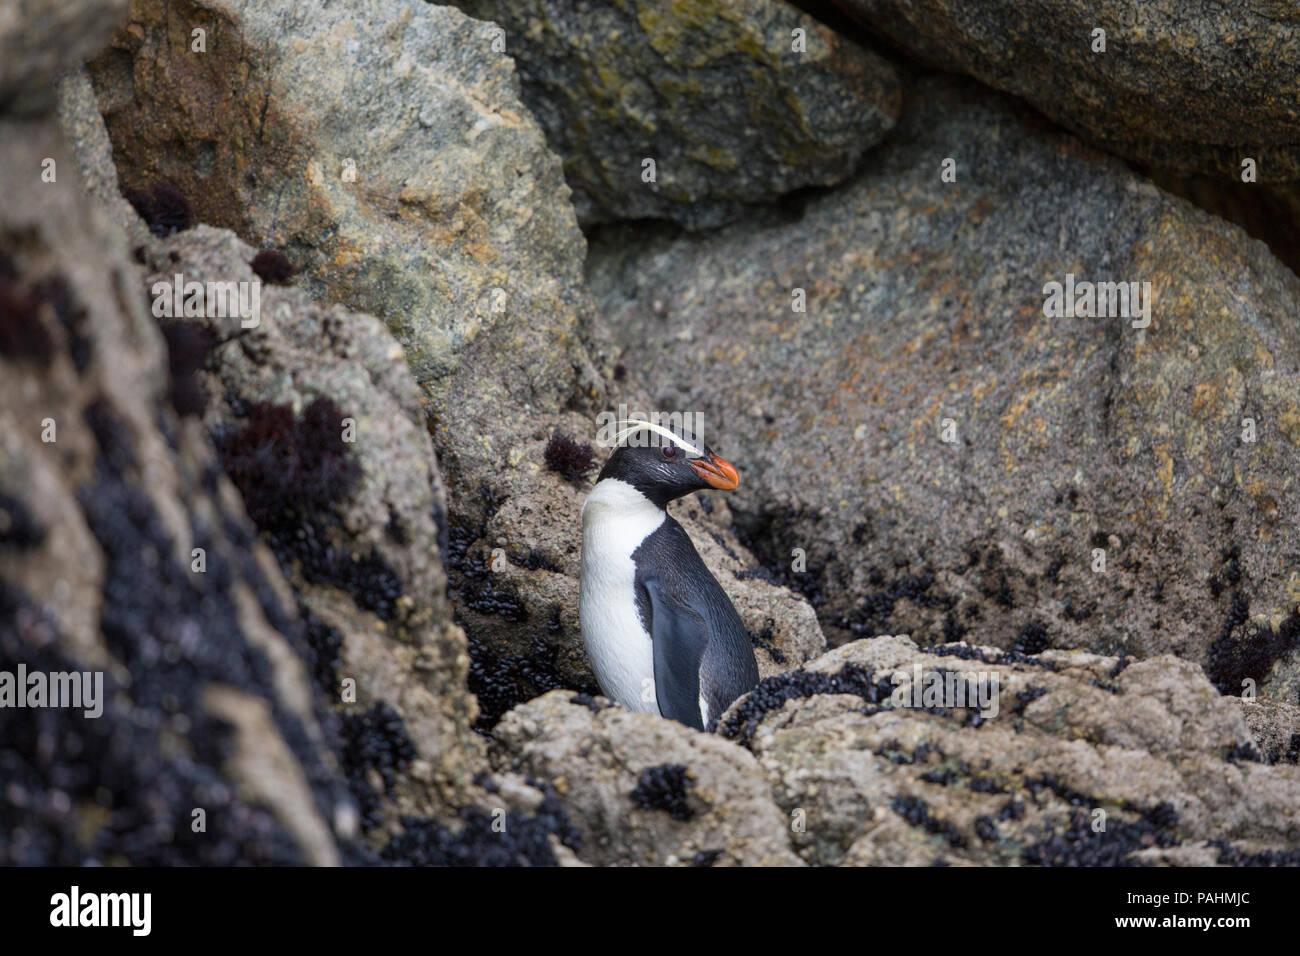 Fiordland penguin (Eudyptes pachyrhynchus) - Stock Image